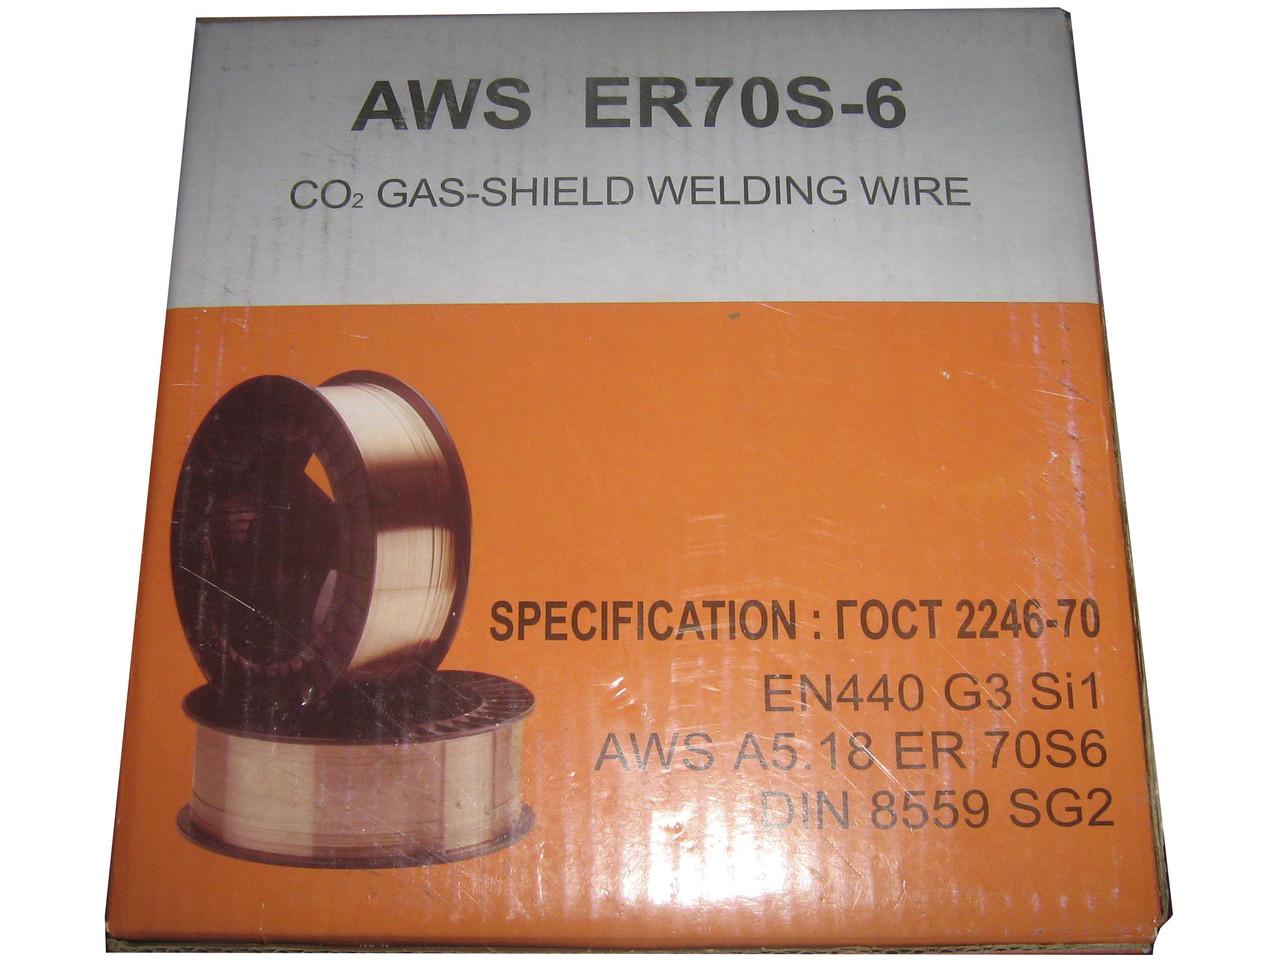 Проволка сварочная омеднённая AWS ER70S-6 1,2 мм, 5 кг